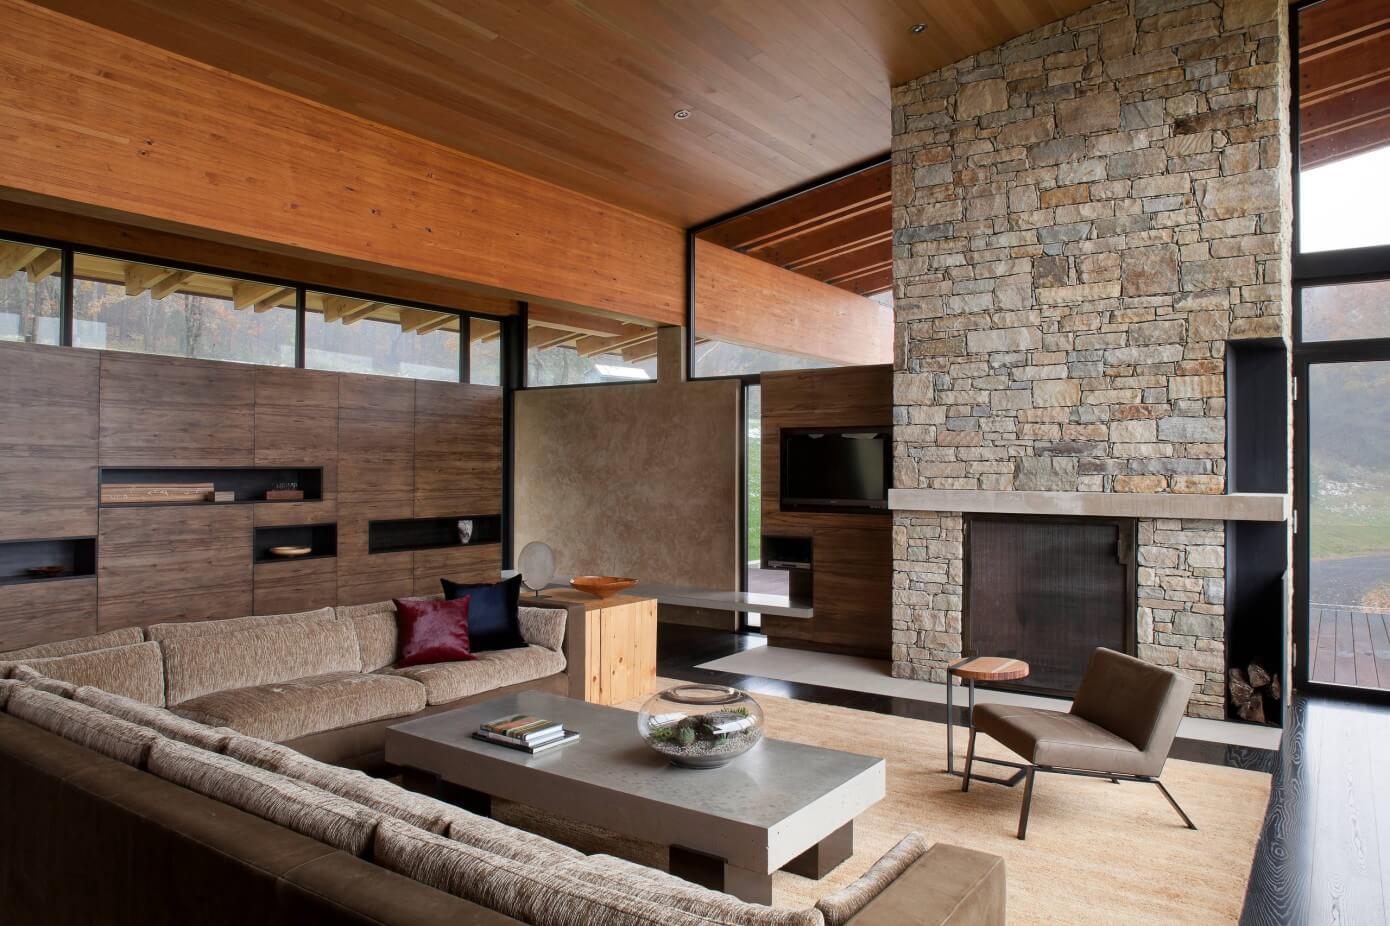 New york house by sergio mercado design homeadore for Modern house new york